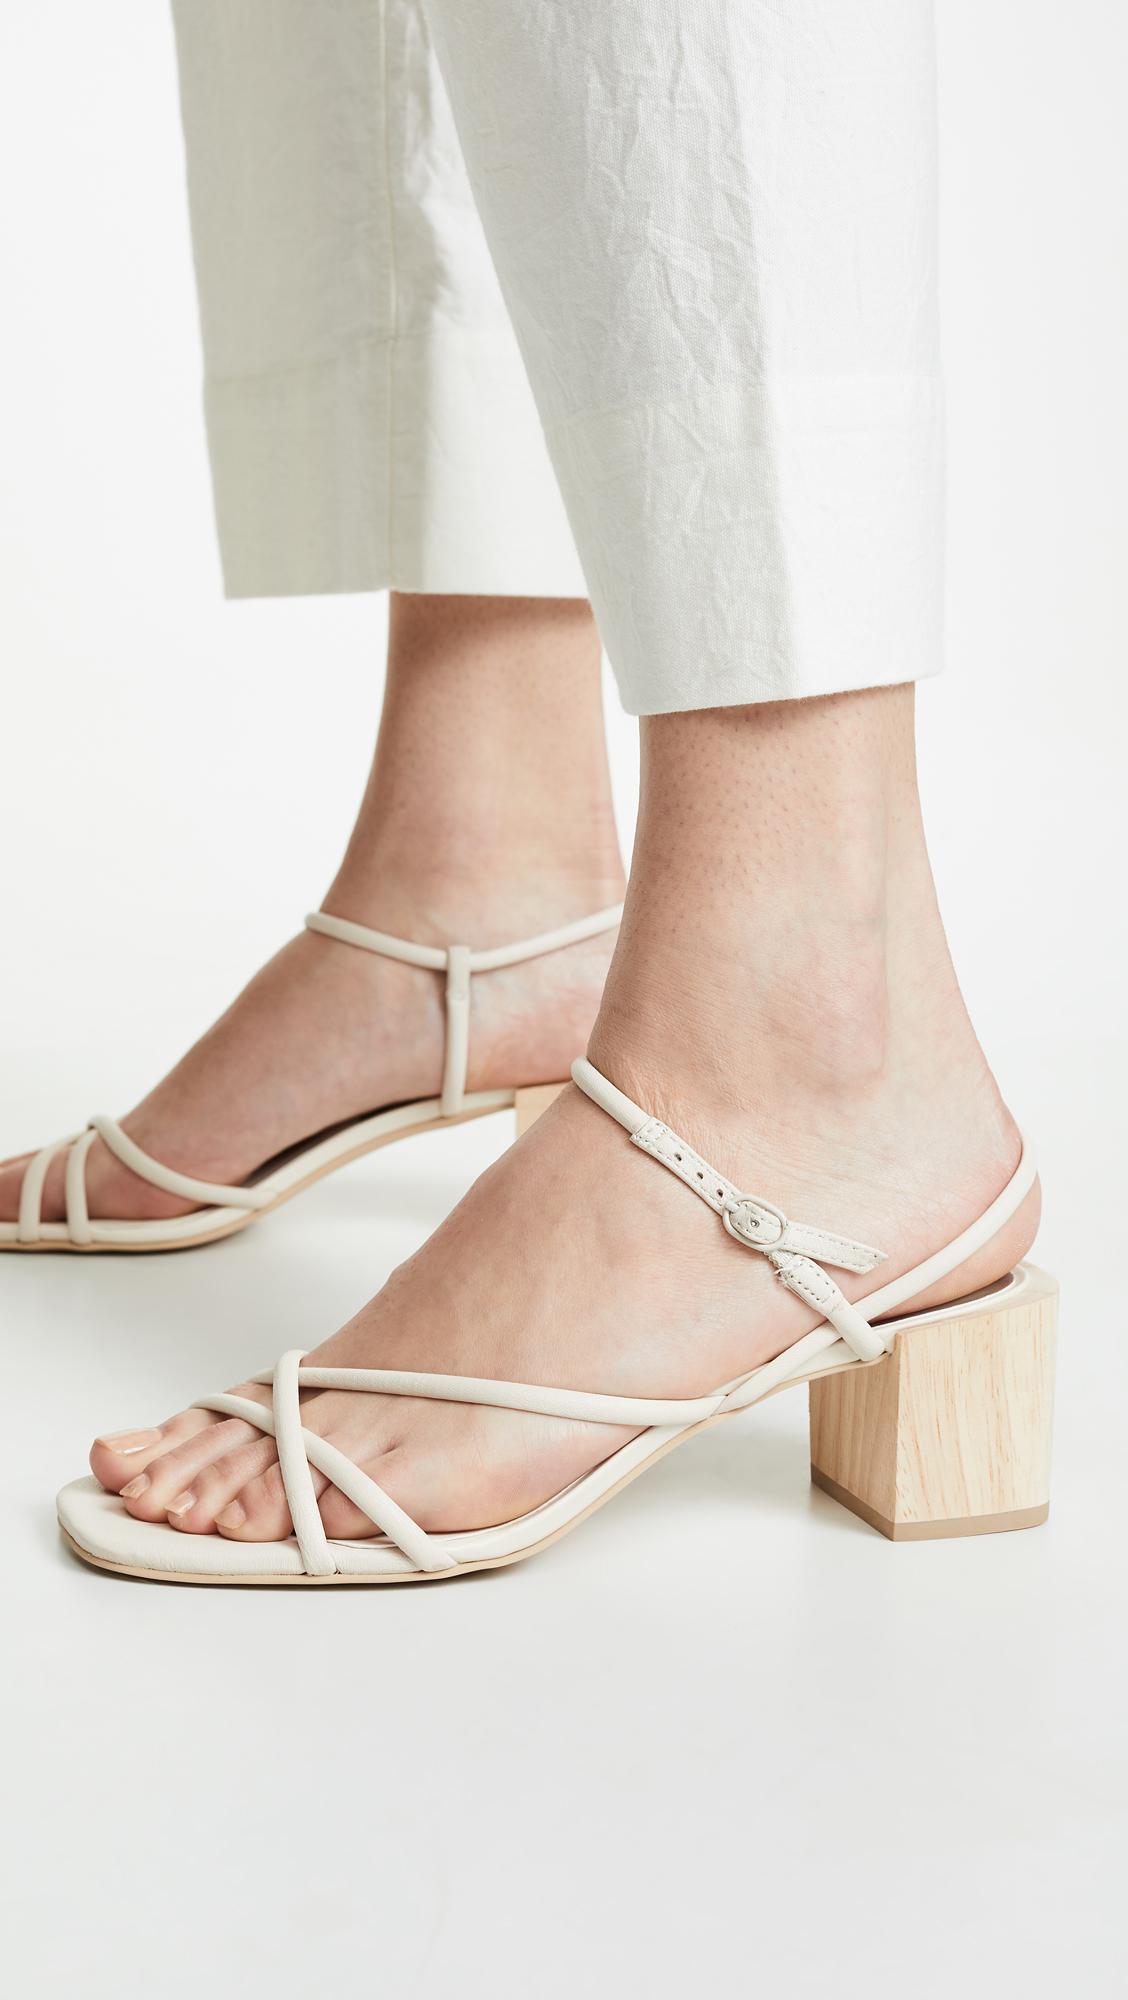 5772c6fafb0 Lyst - Dolce Vita Zayla Block Heel Sandals in White